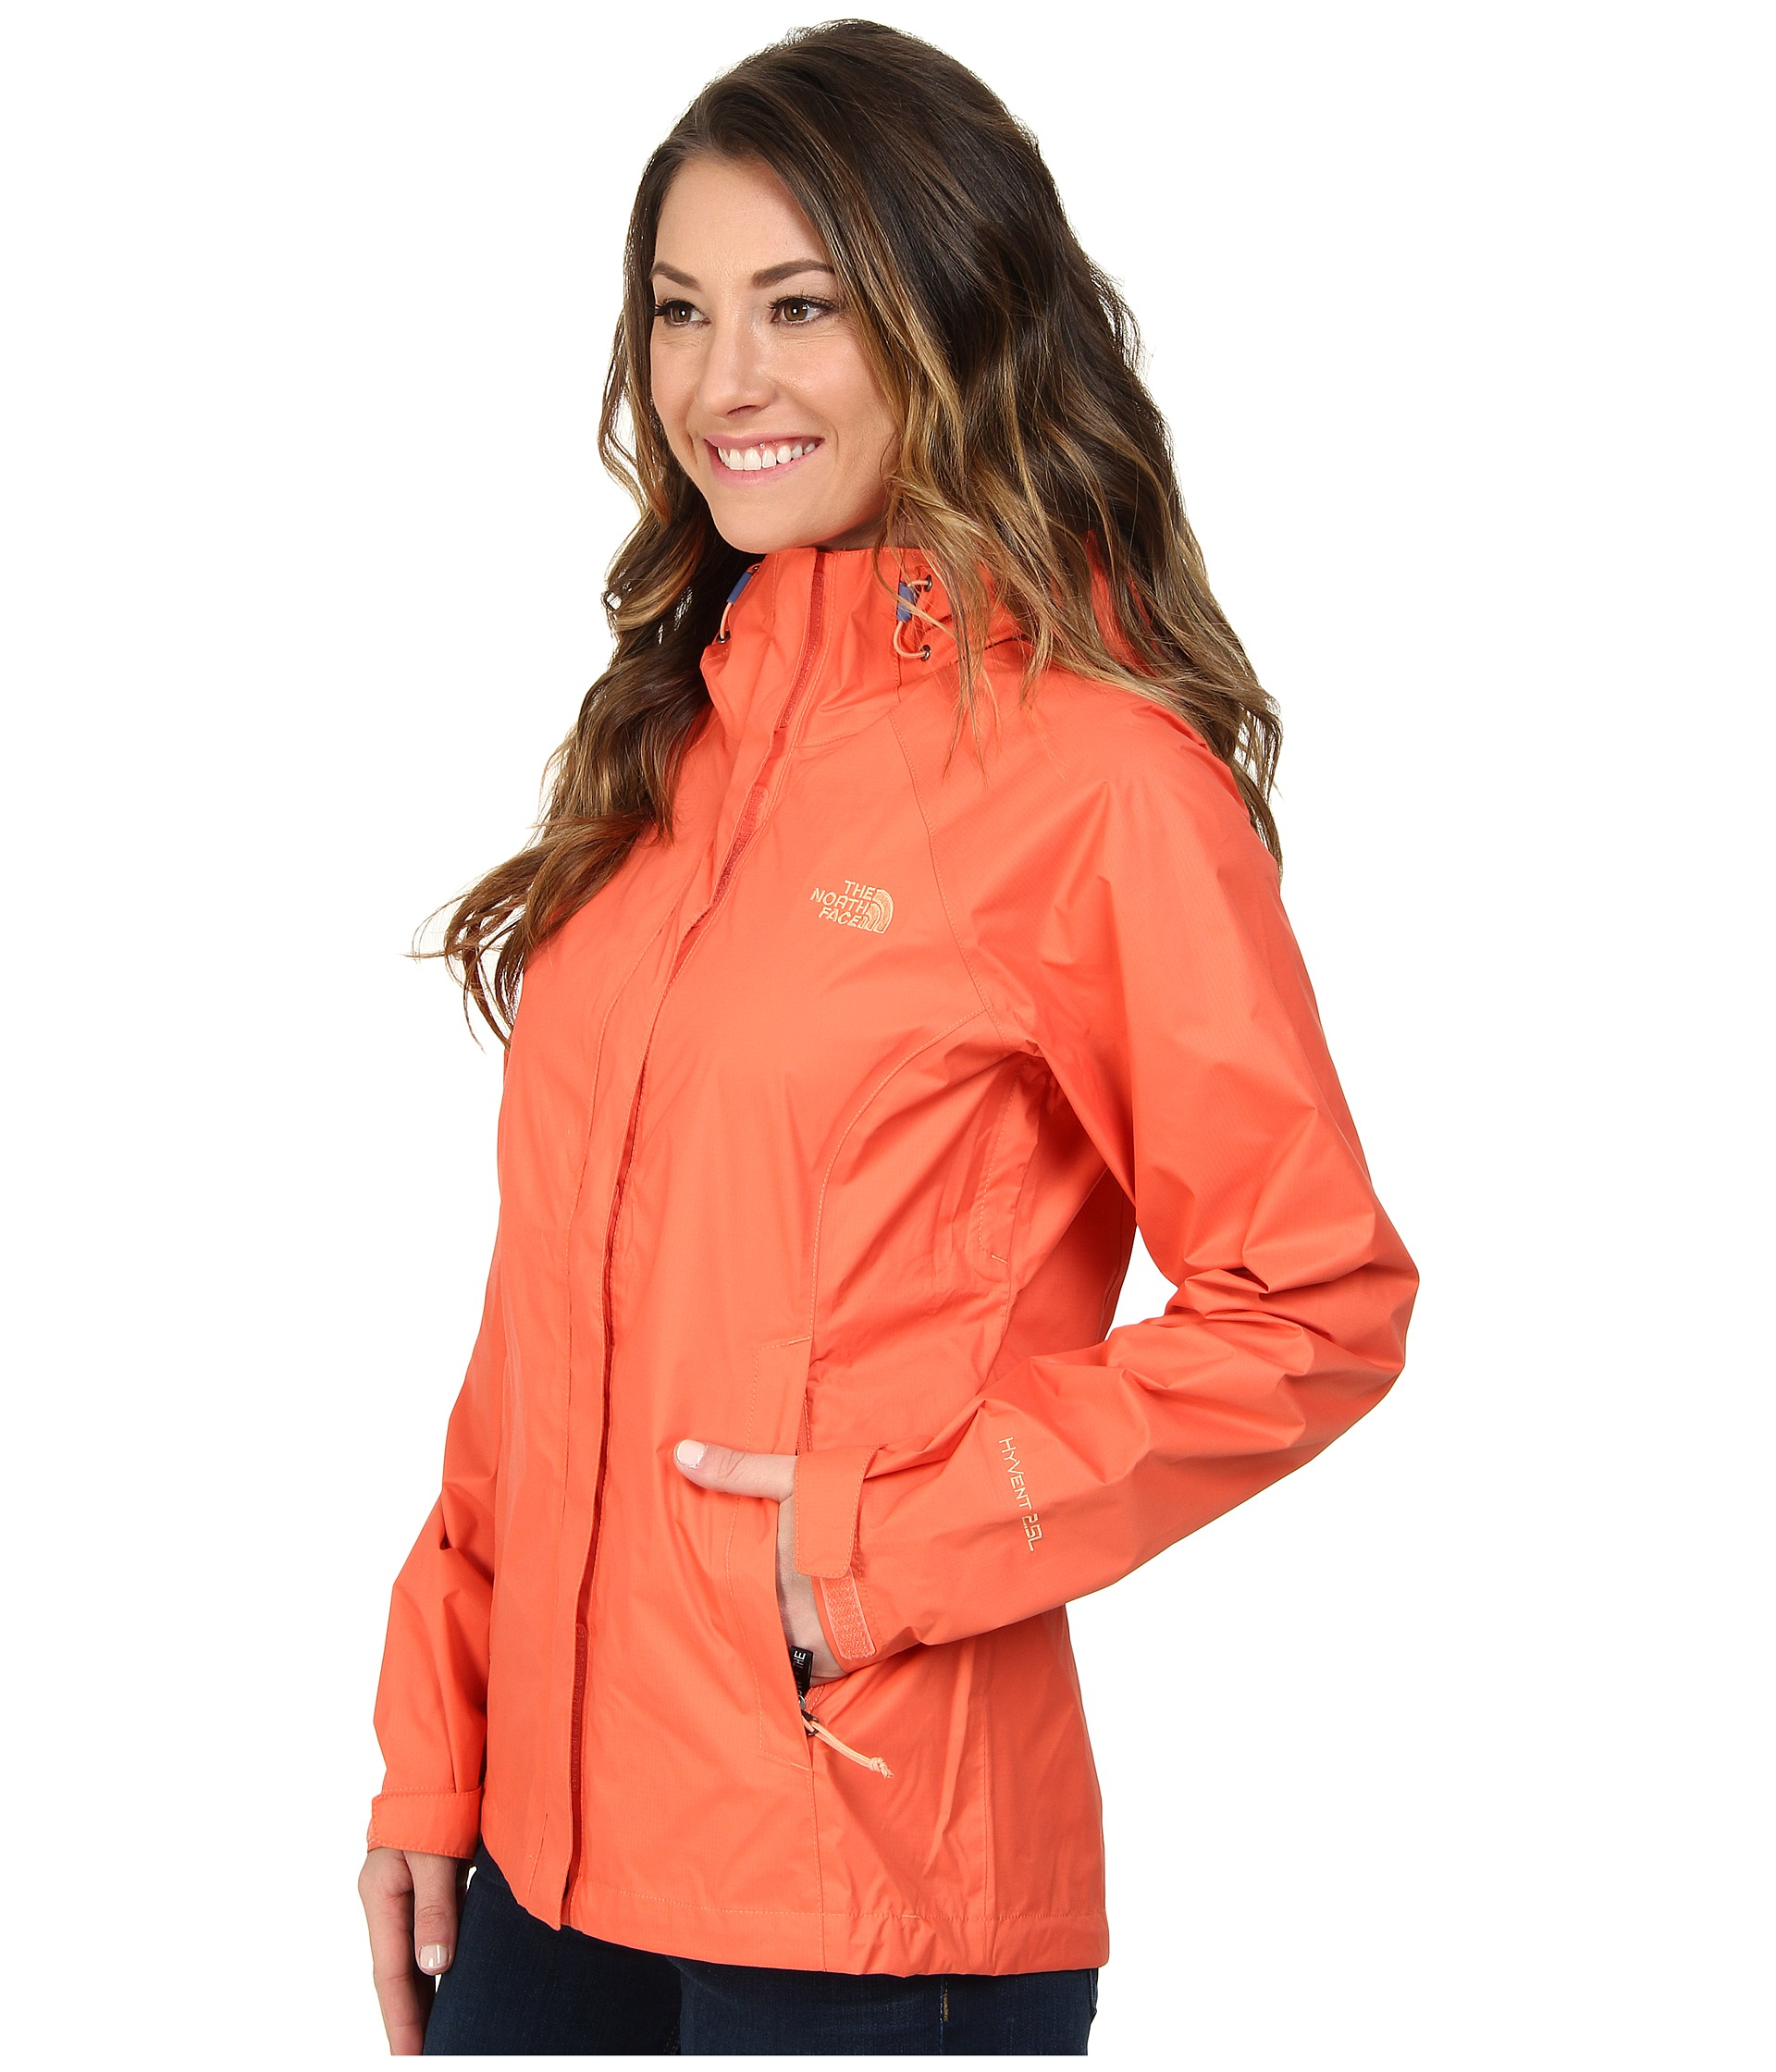 046b1259f The North Face Orange Venture Jacket